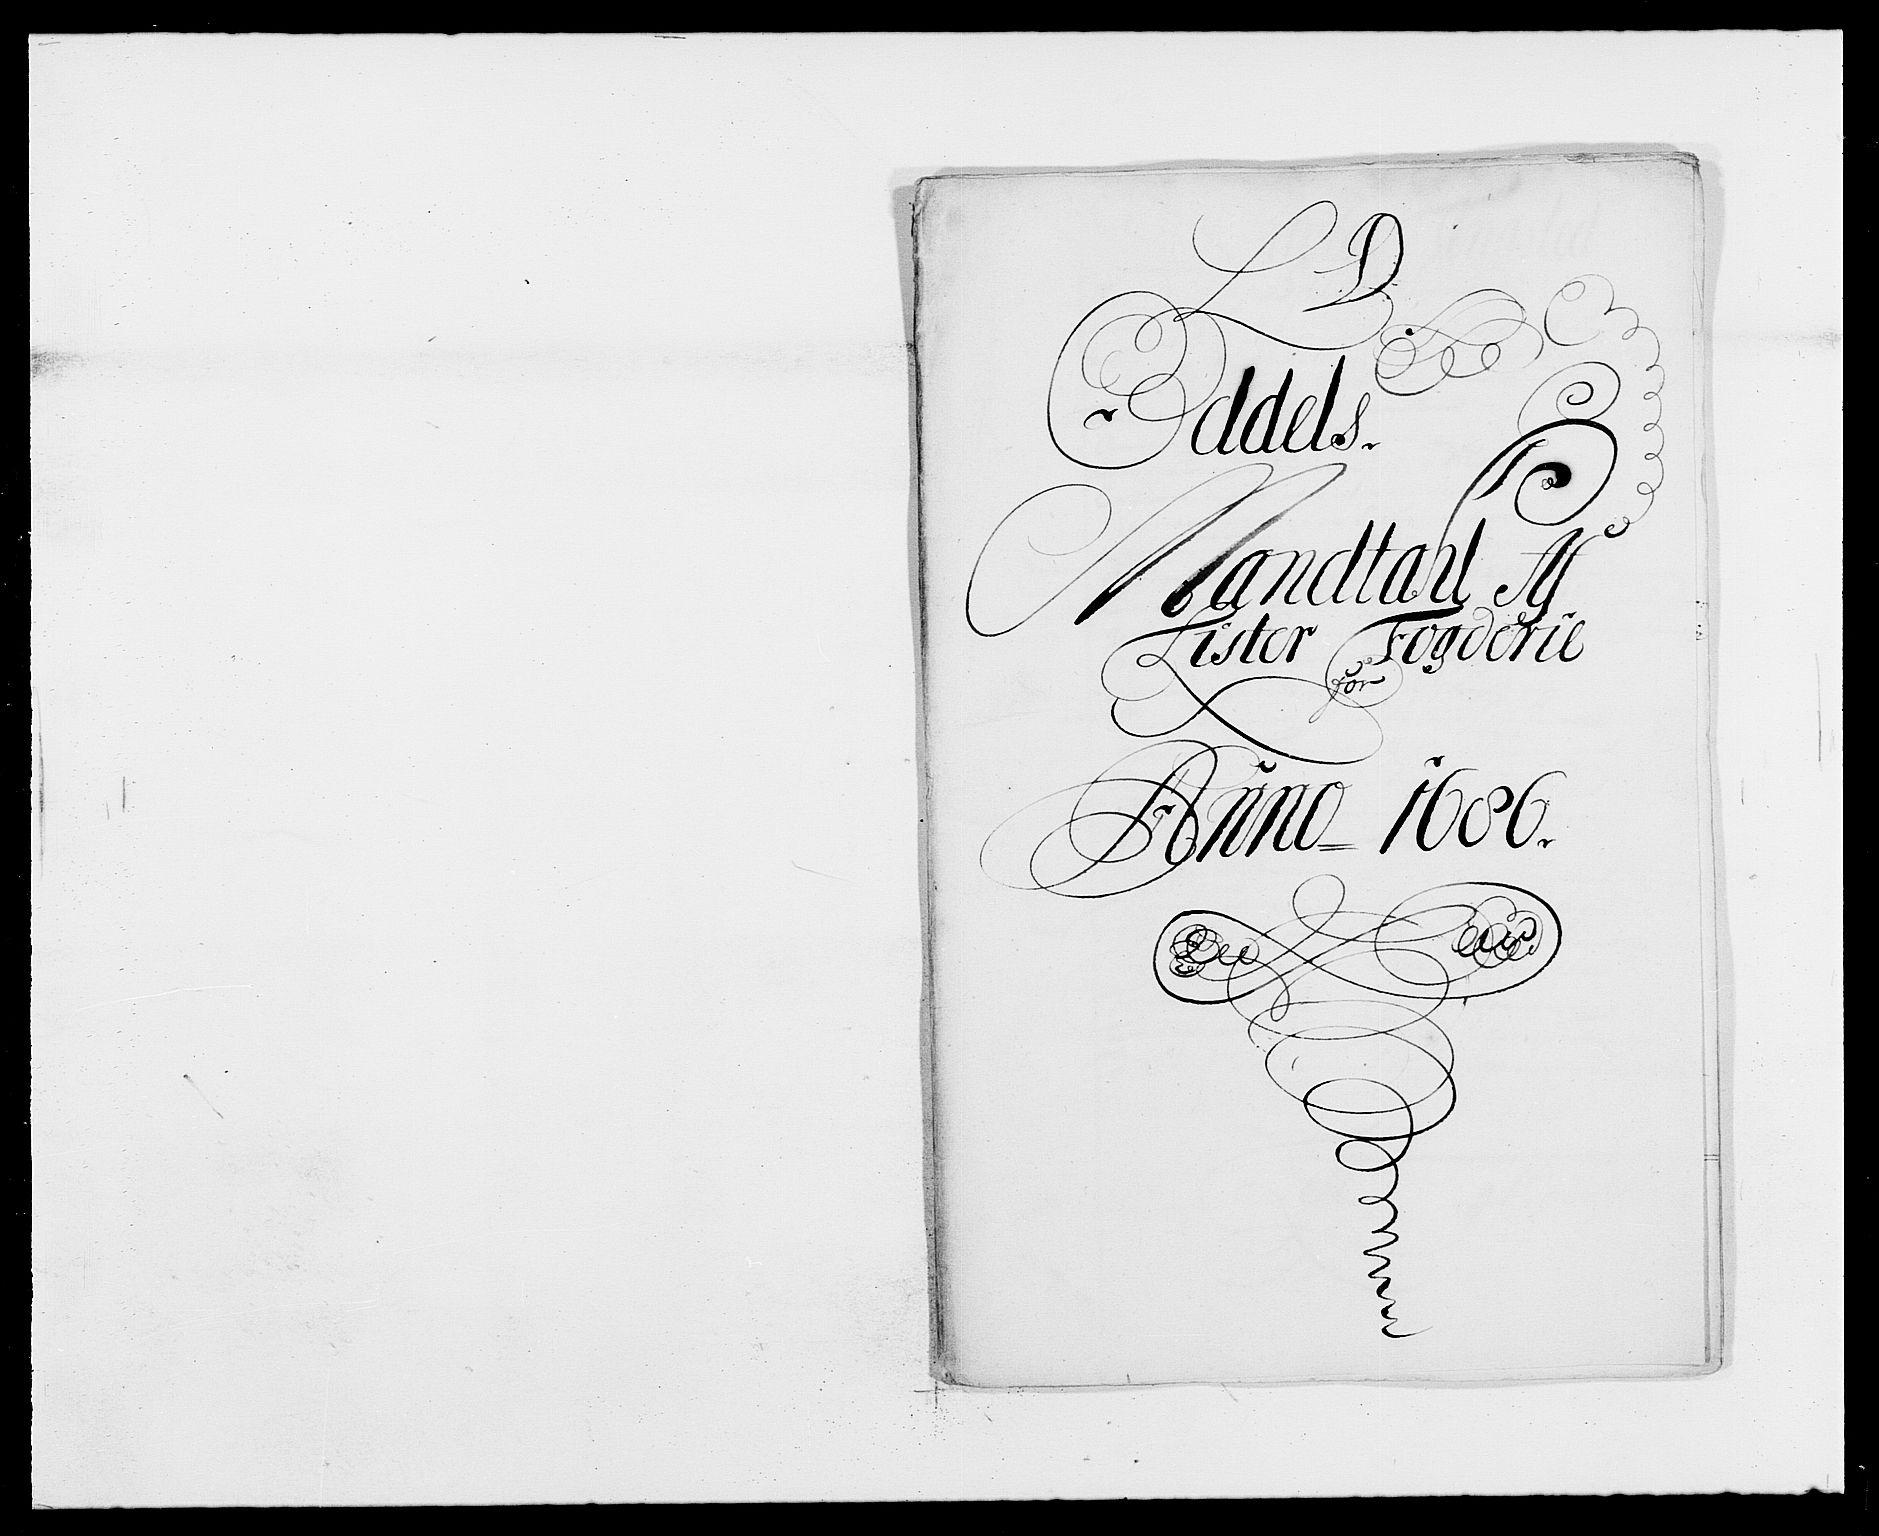 RA, Rentekammeret inntil 1814, Reviderte regnskaper, Fogderegnskap, R41/L2534: Fogderegnskap Lista, 1686-1688, s. 56